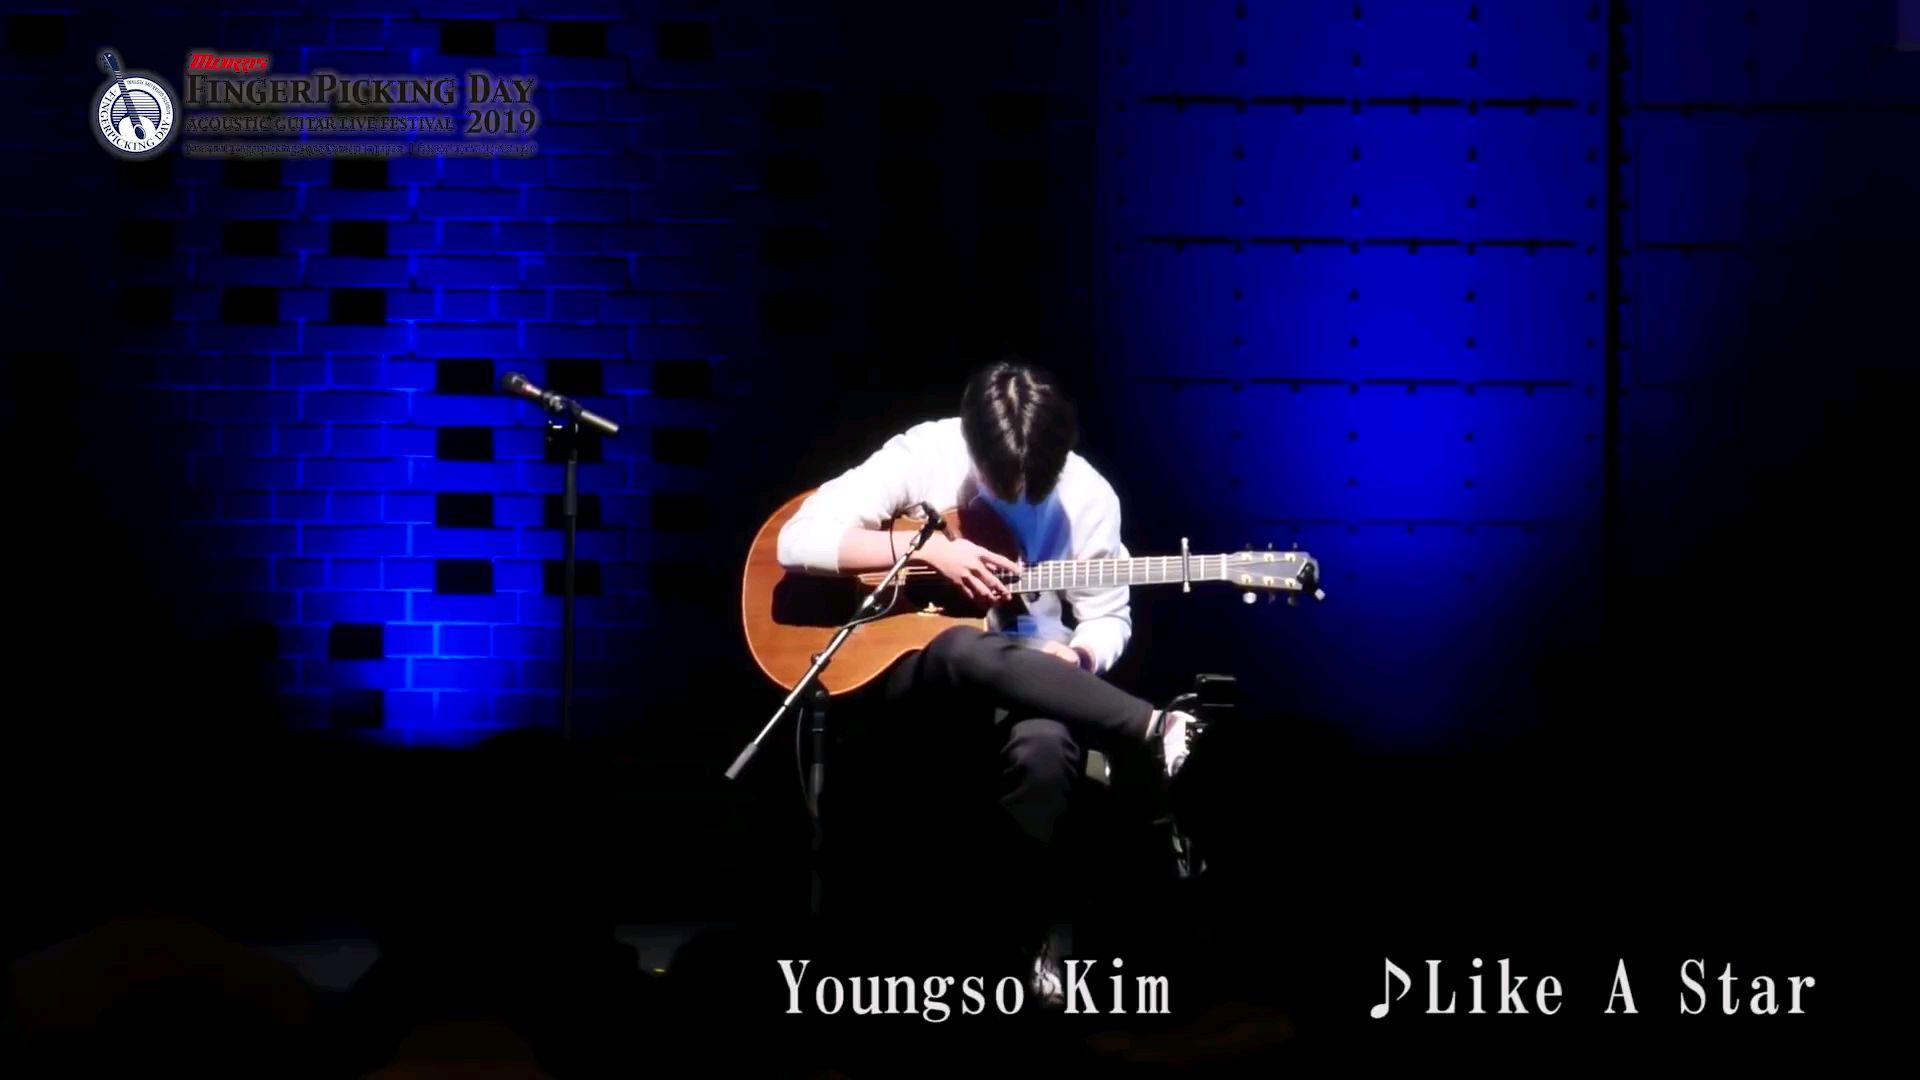 [2019日本指弹大赛冠军作品] Like a star_Youngso Kim